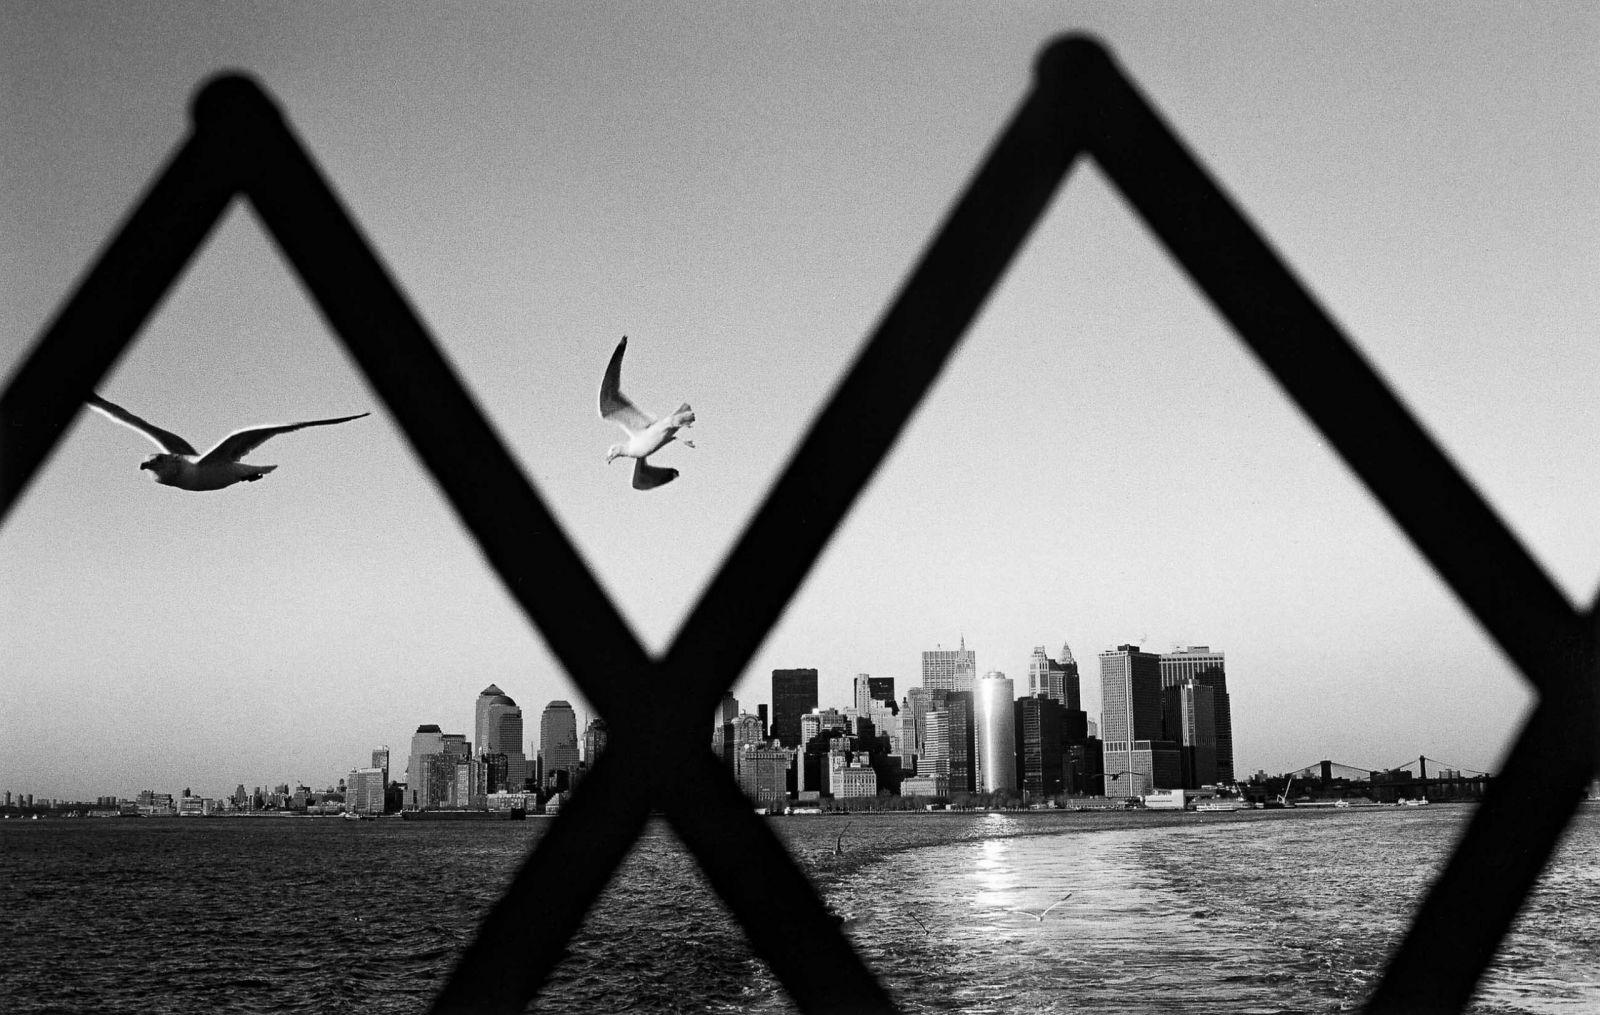 Herzau New York 9/11 nineeleven Ground Zero